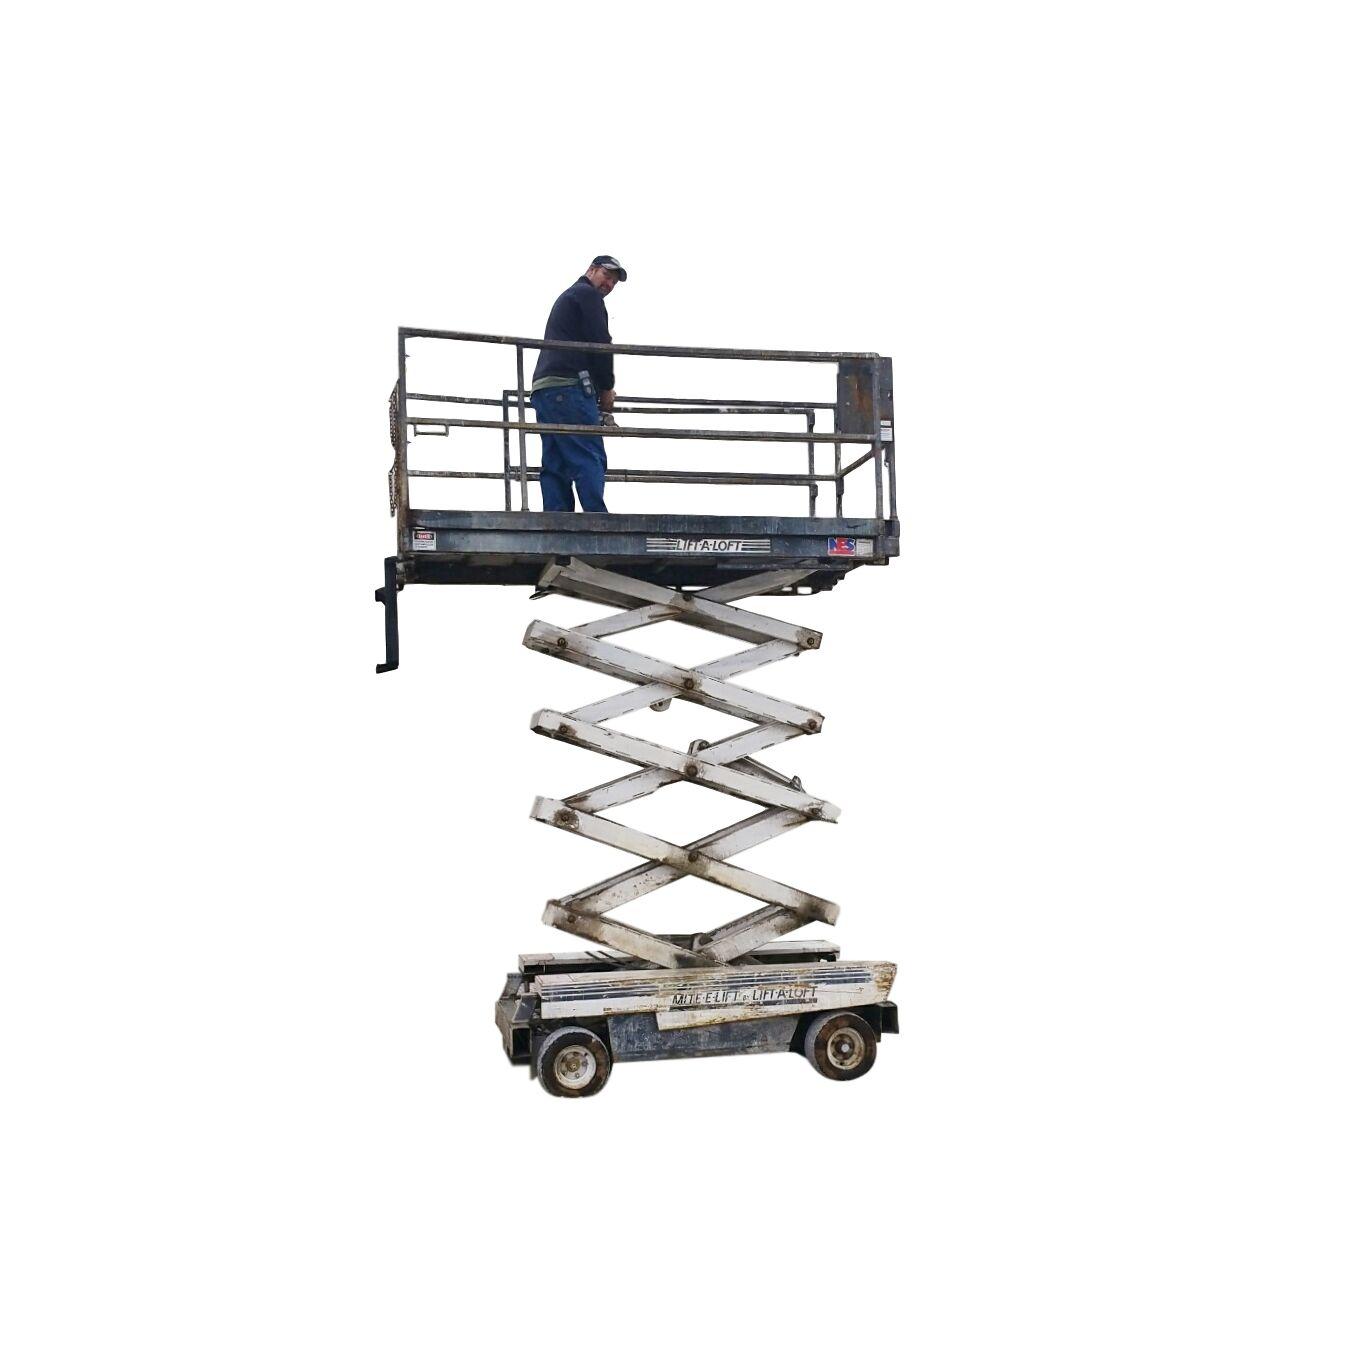 Used Lift A Loft Mite E Lift Work Platform Scissor Lift